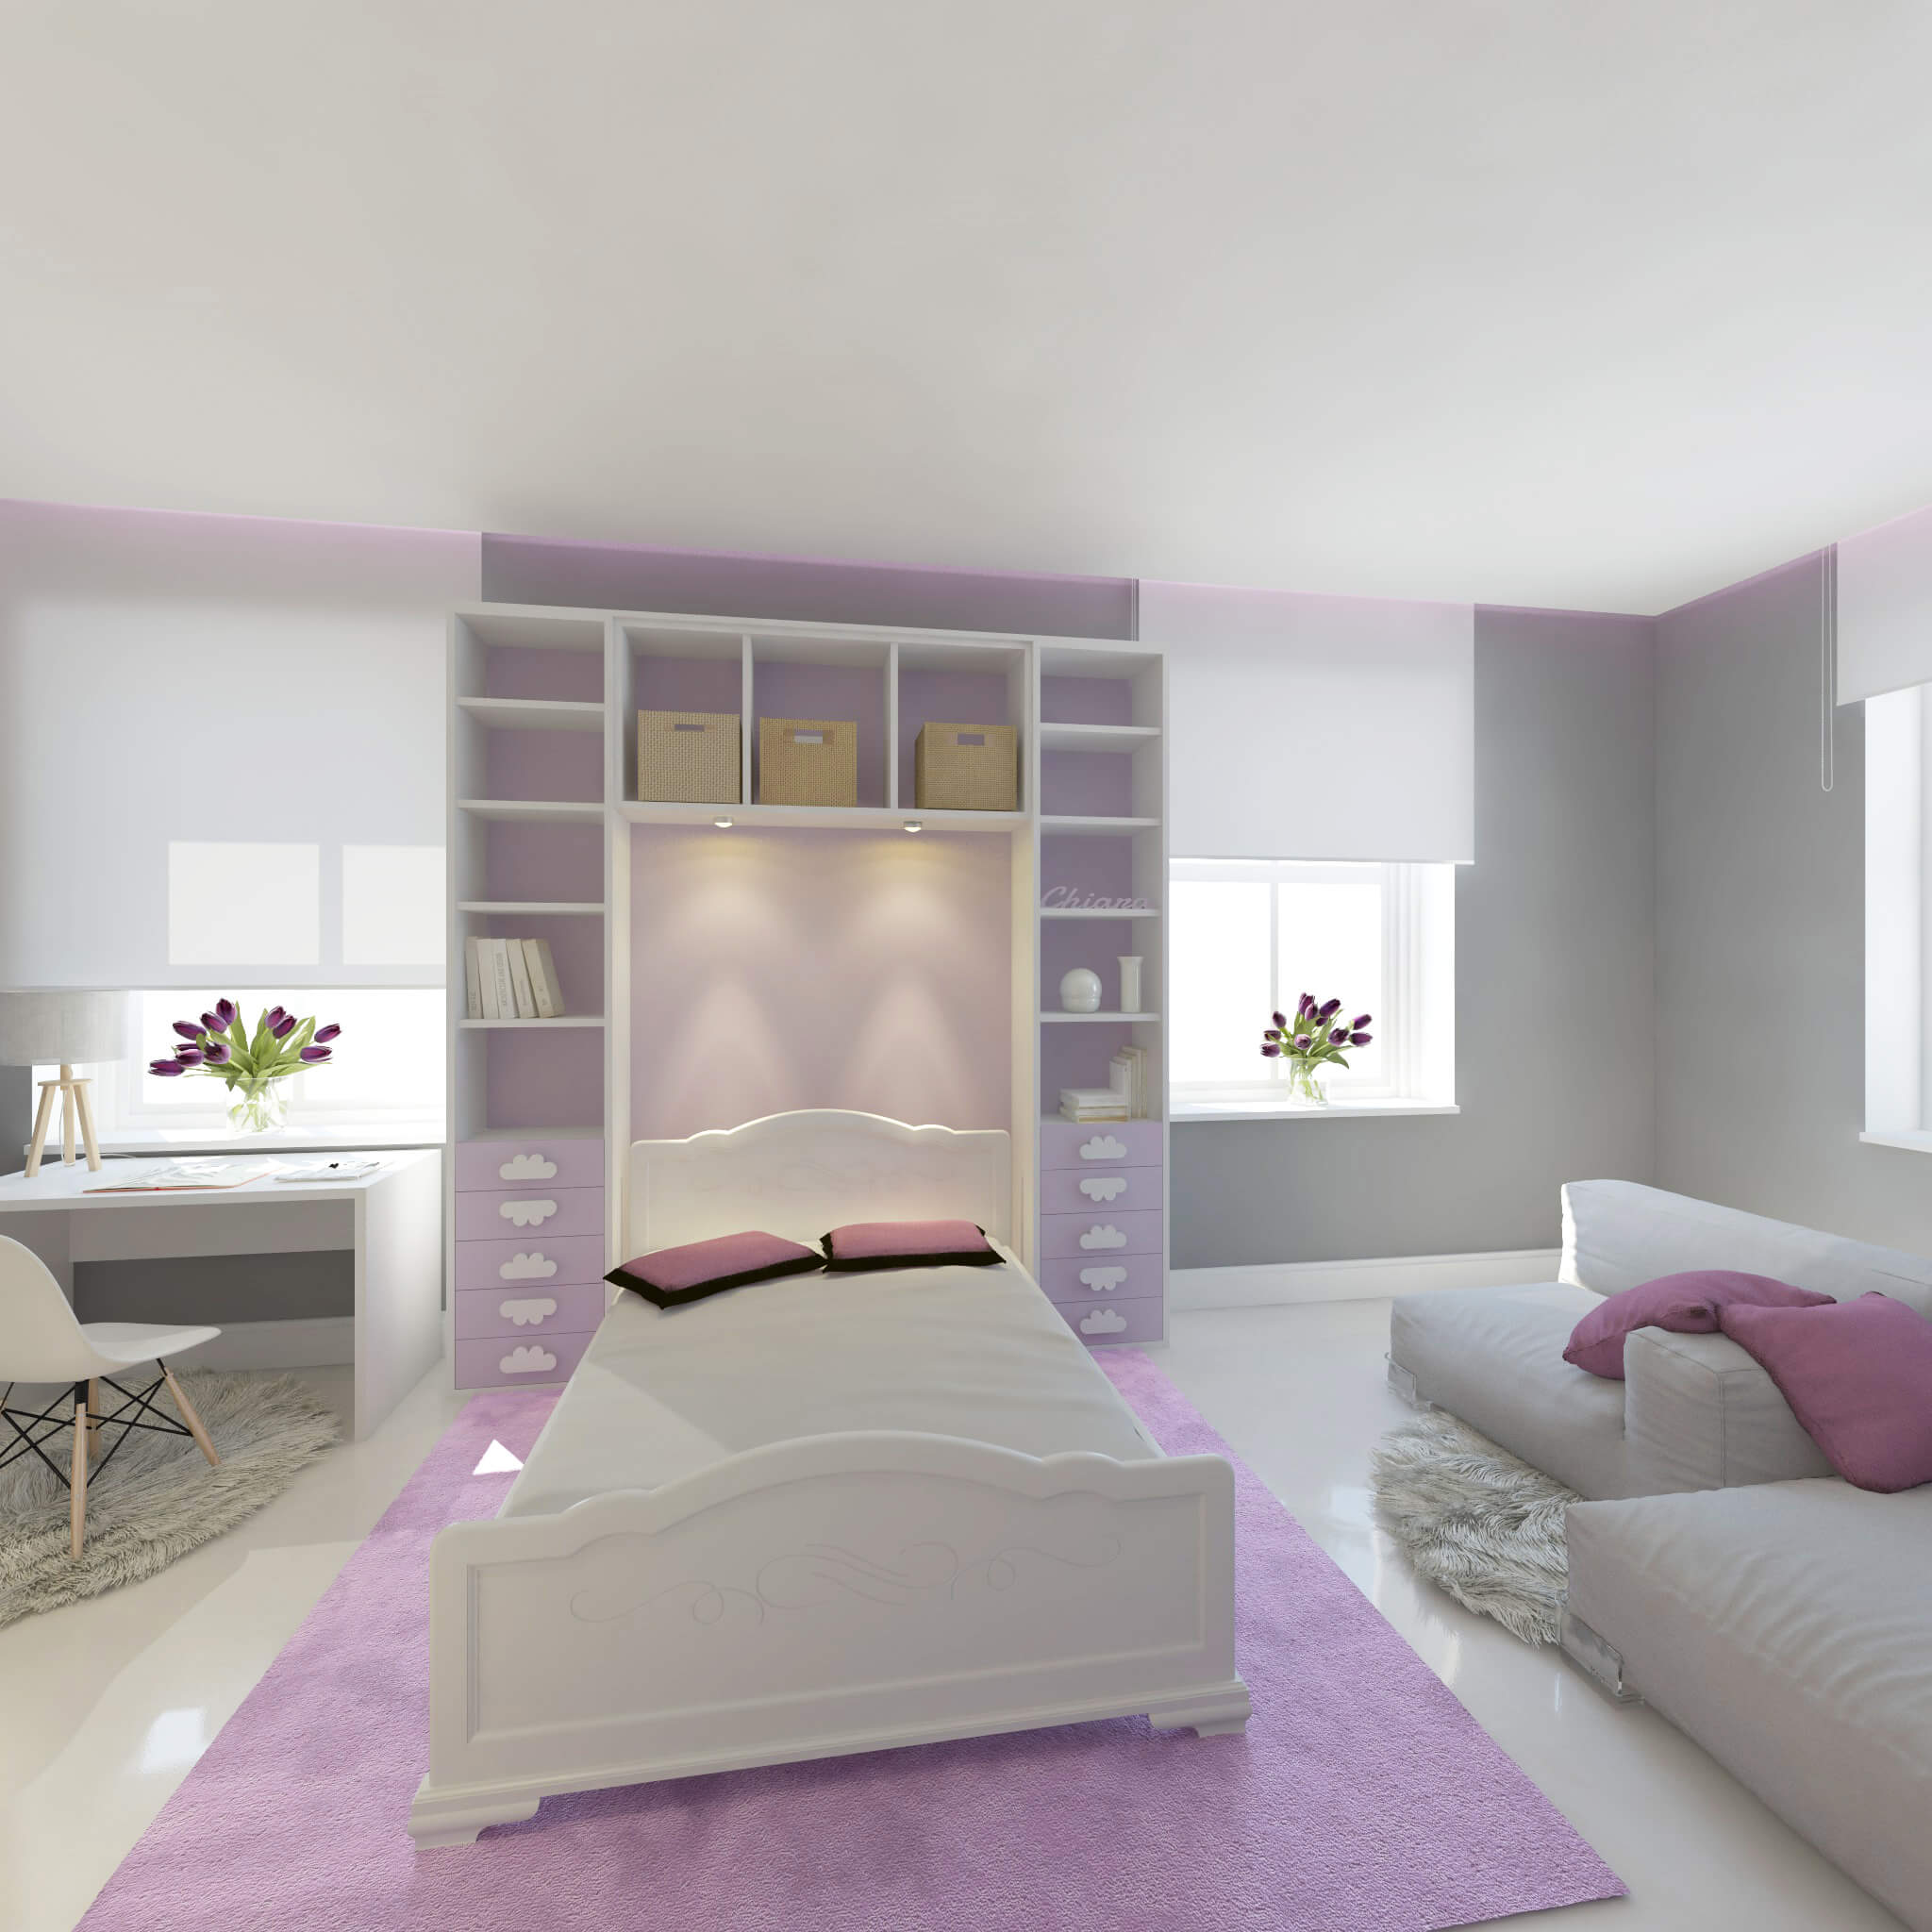 Moderne Schlafzimmer Design by Torsten Müller aus Bad Honnef nähe Köln Bonn Verkauf Beratung Planung 2018